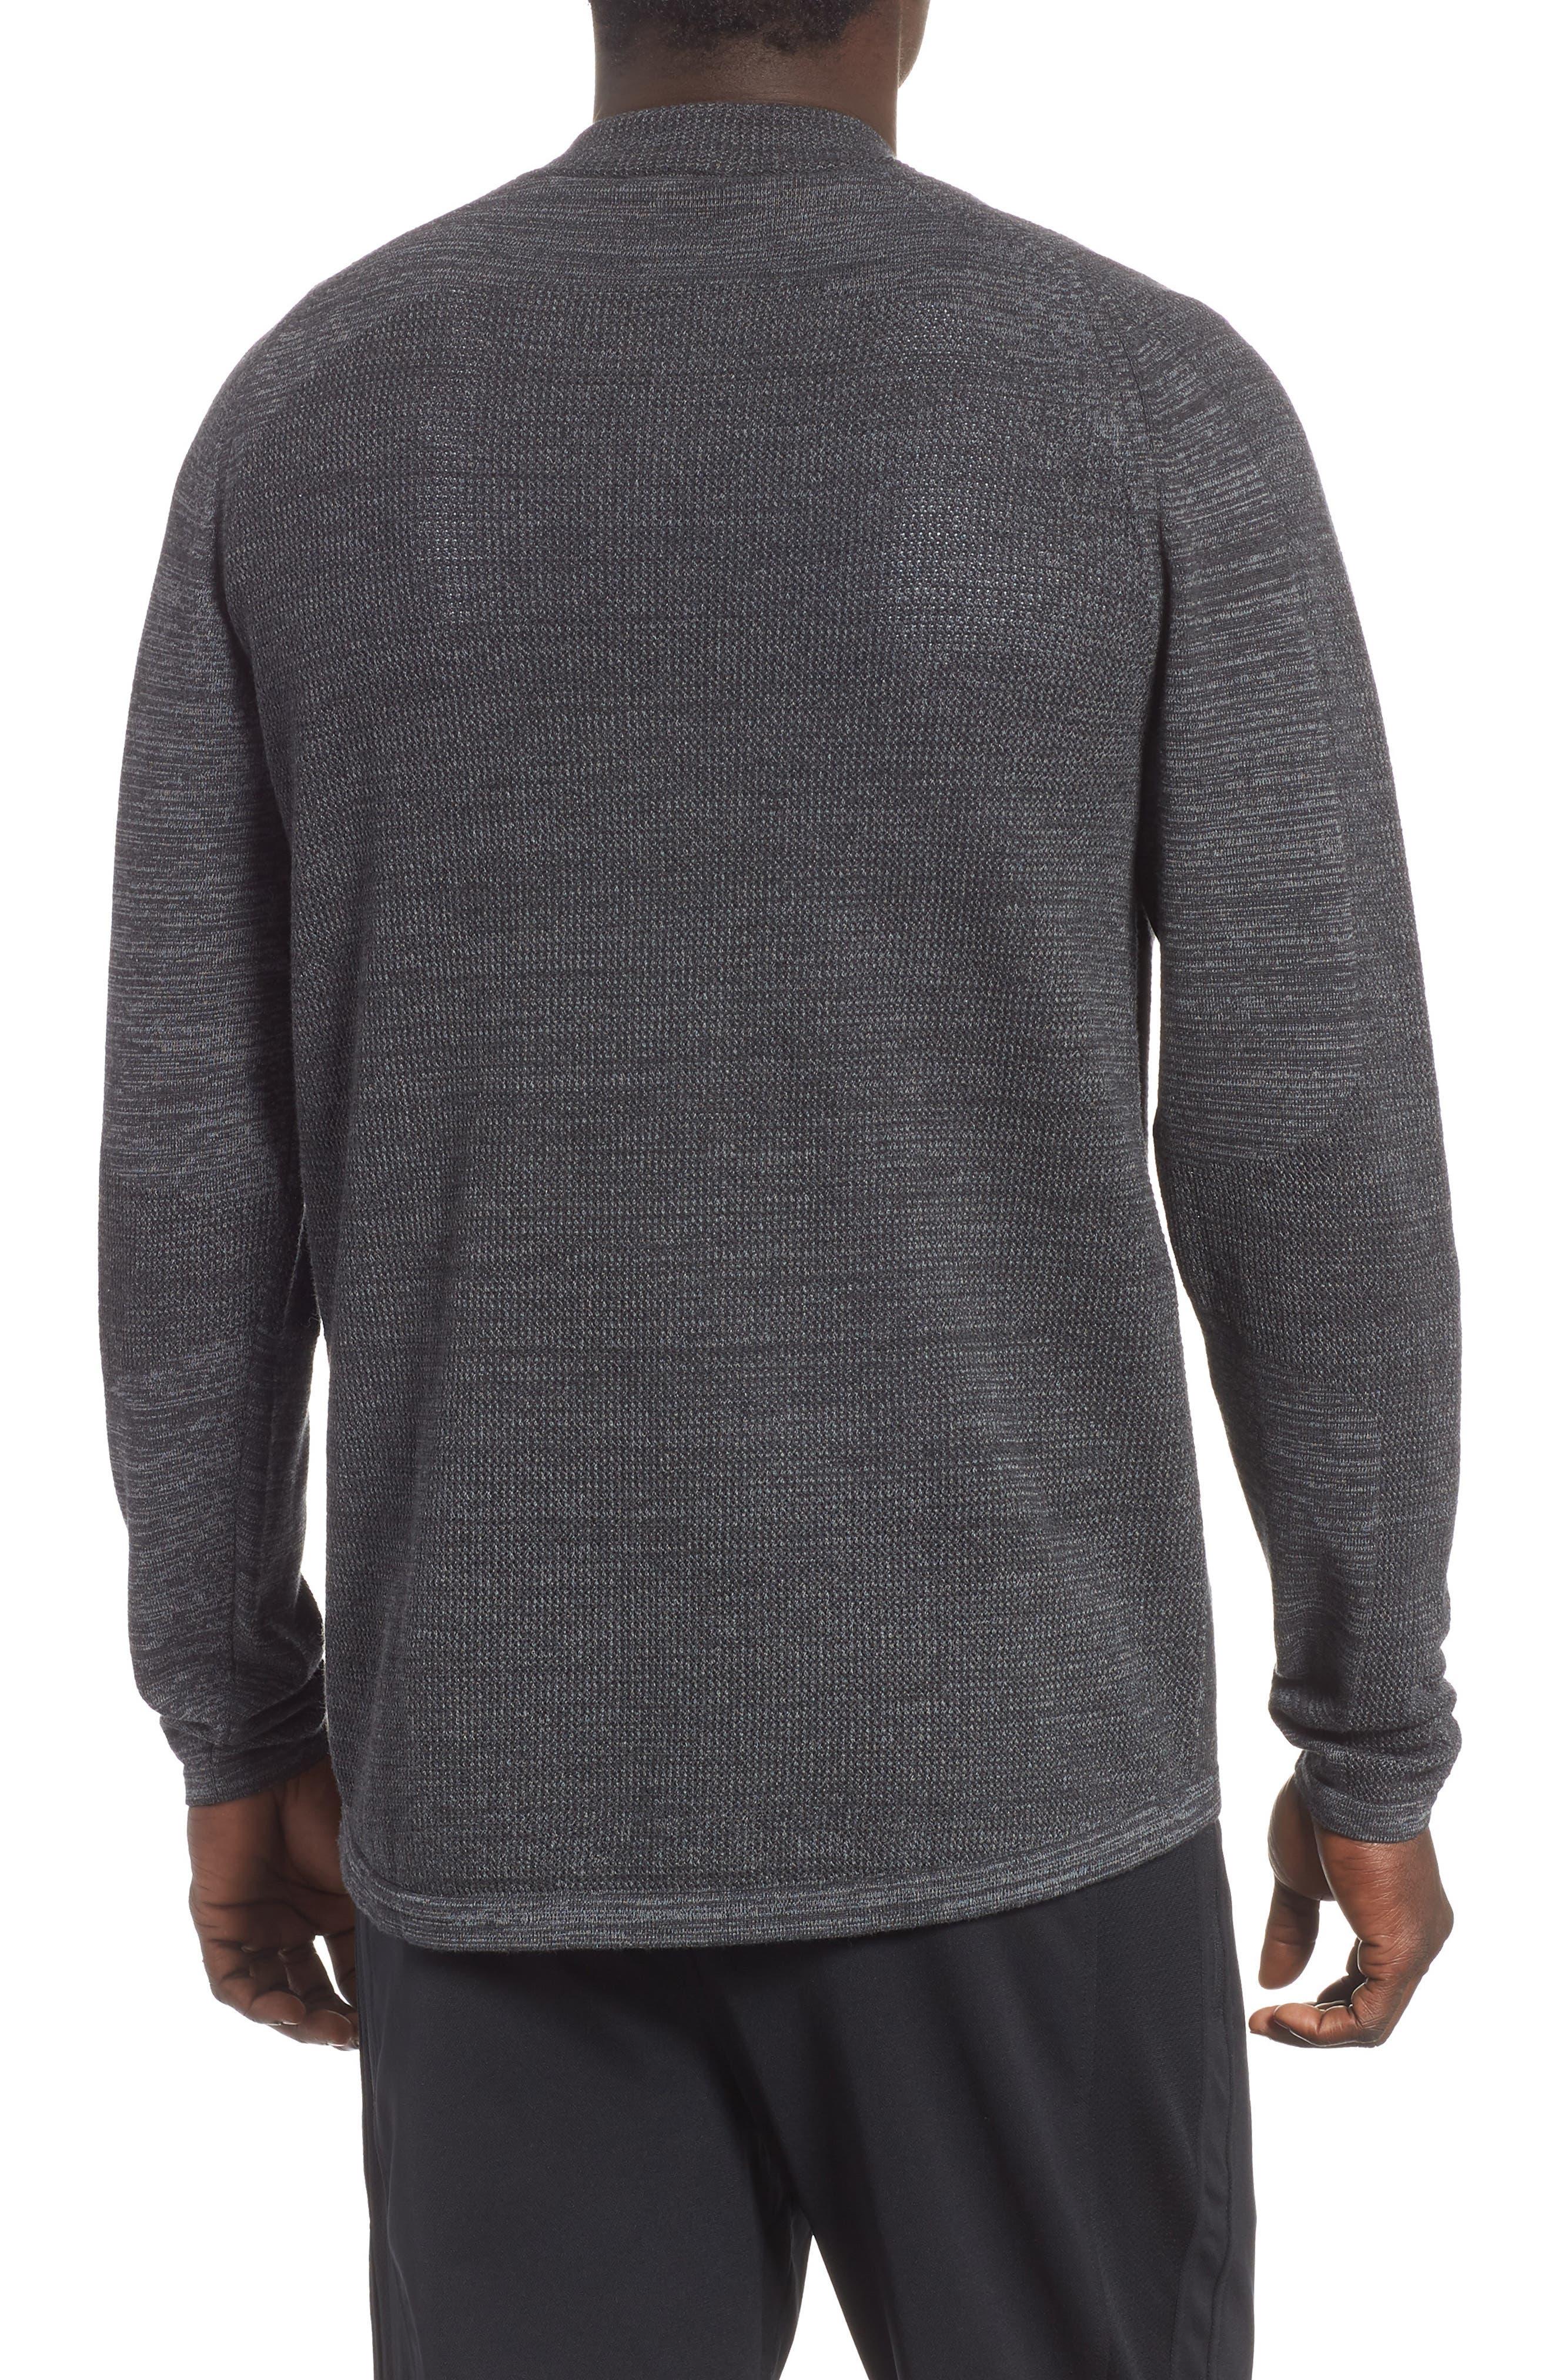 Tech Sweater Baseball Jacket,                             Alternate thumbnail 2, color,                             BLACK OXIDE SPACEDYE